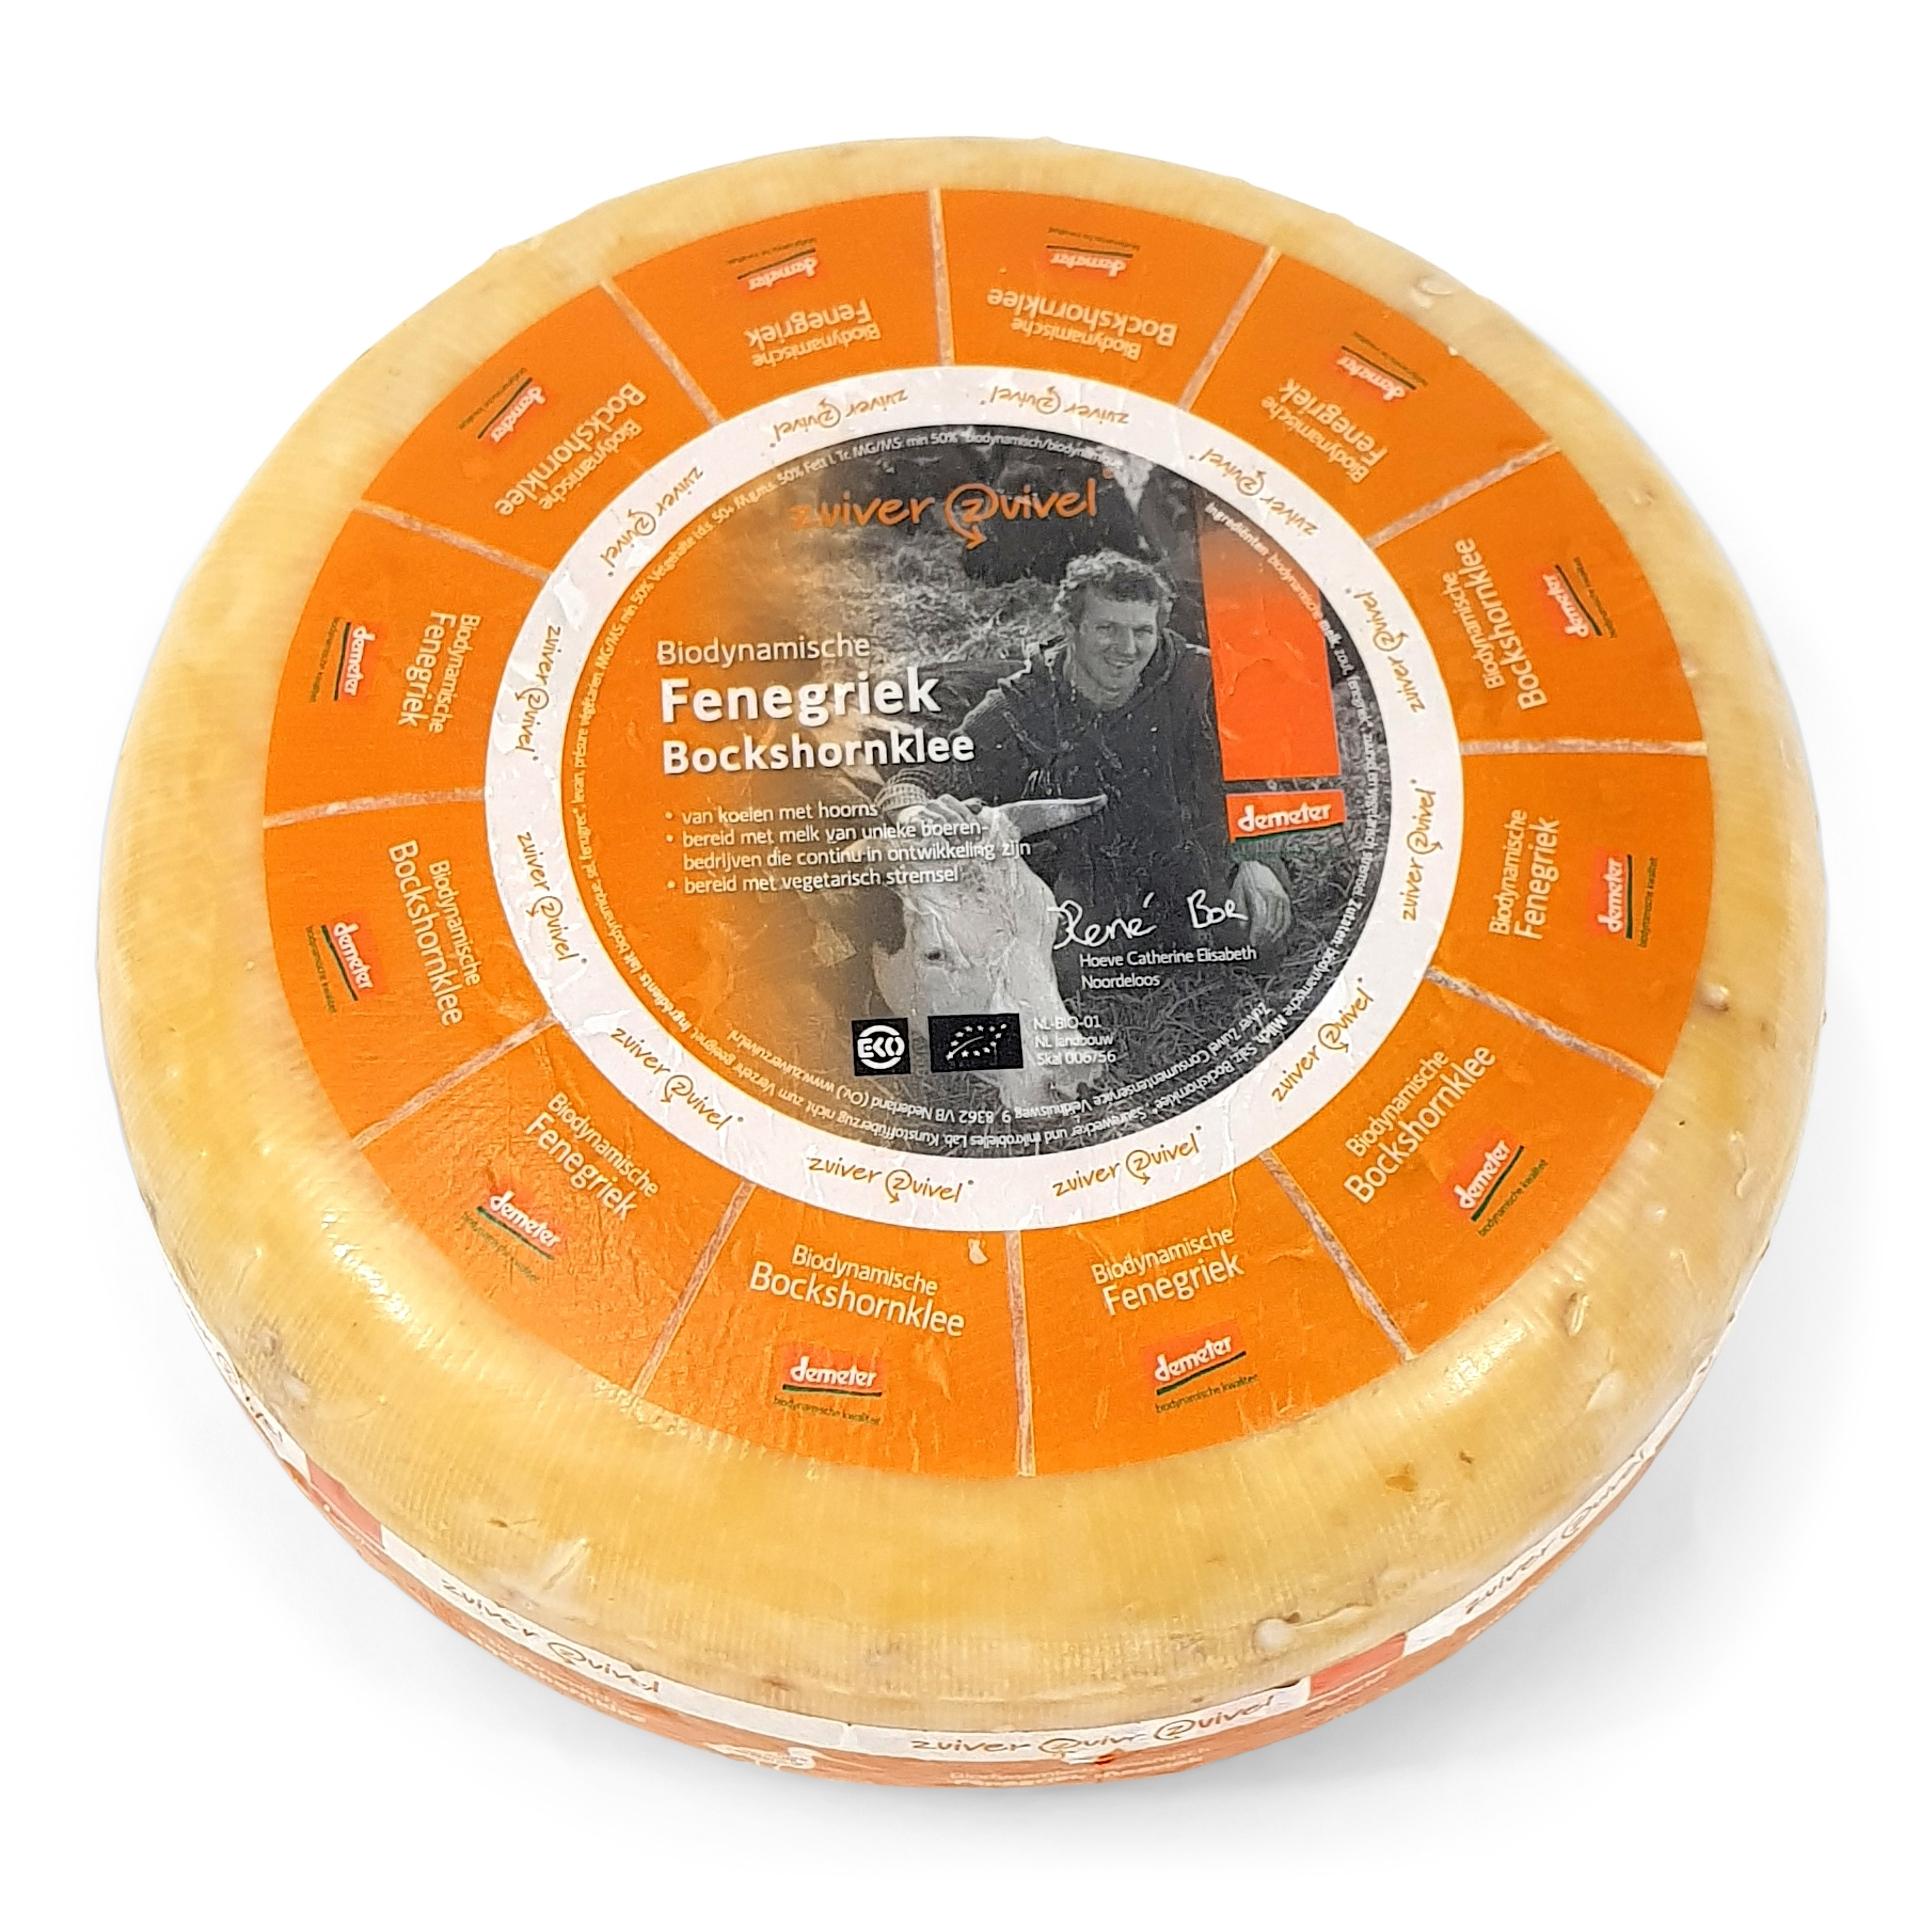 5kg Hele Fenegriek Goudse Biologisch vegetarisch dynamische kaas - Demeter 50+